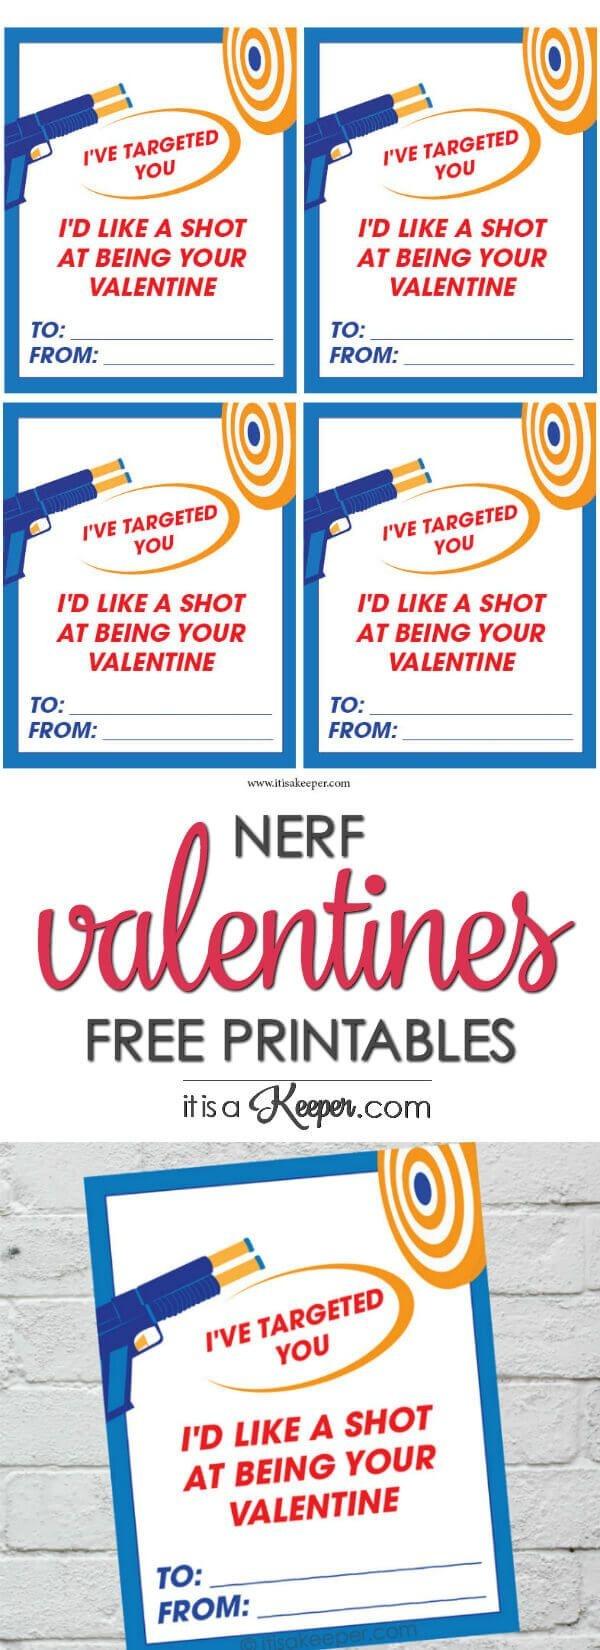 Nerf Valentine Printables - Free Printable Nerf Themed Valentines - Free Printable Nerf